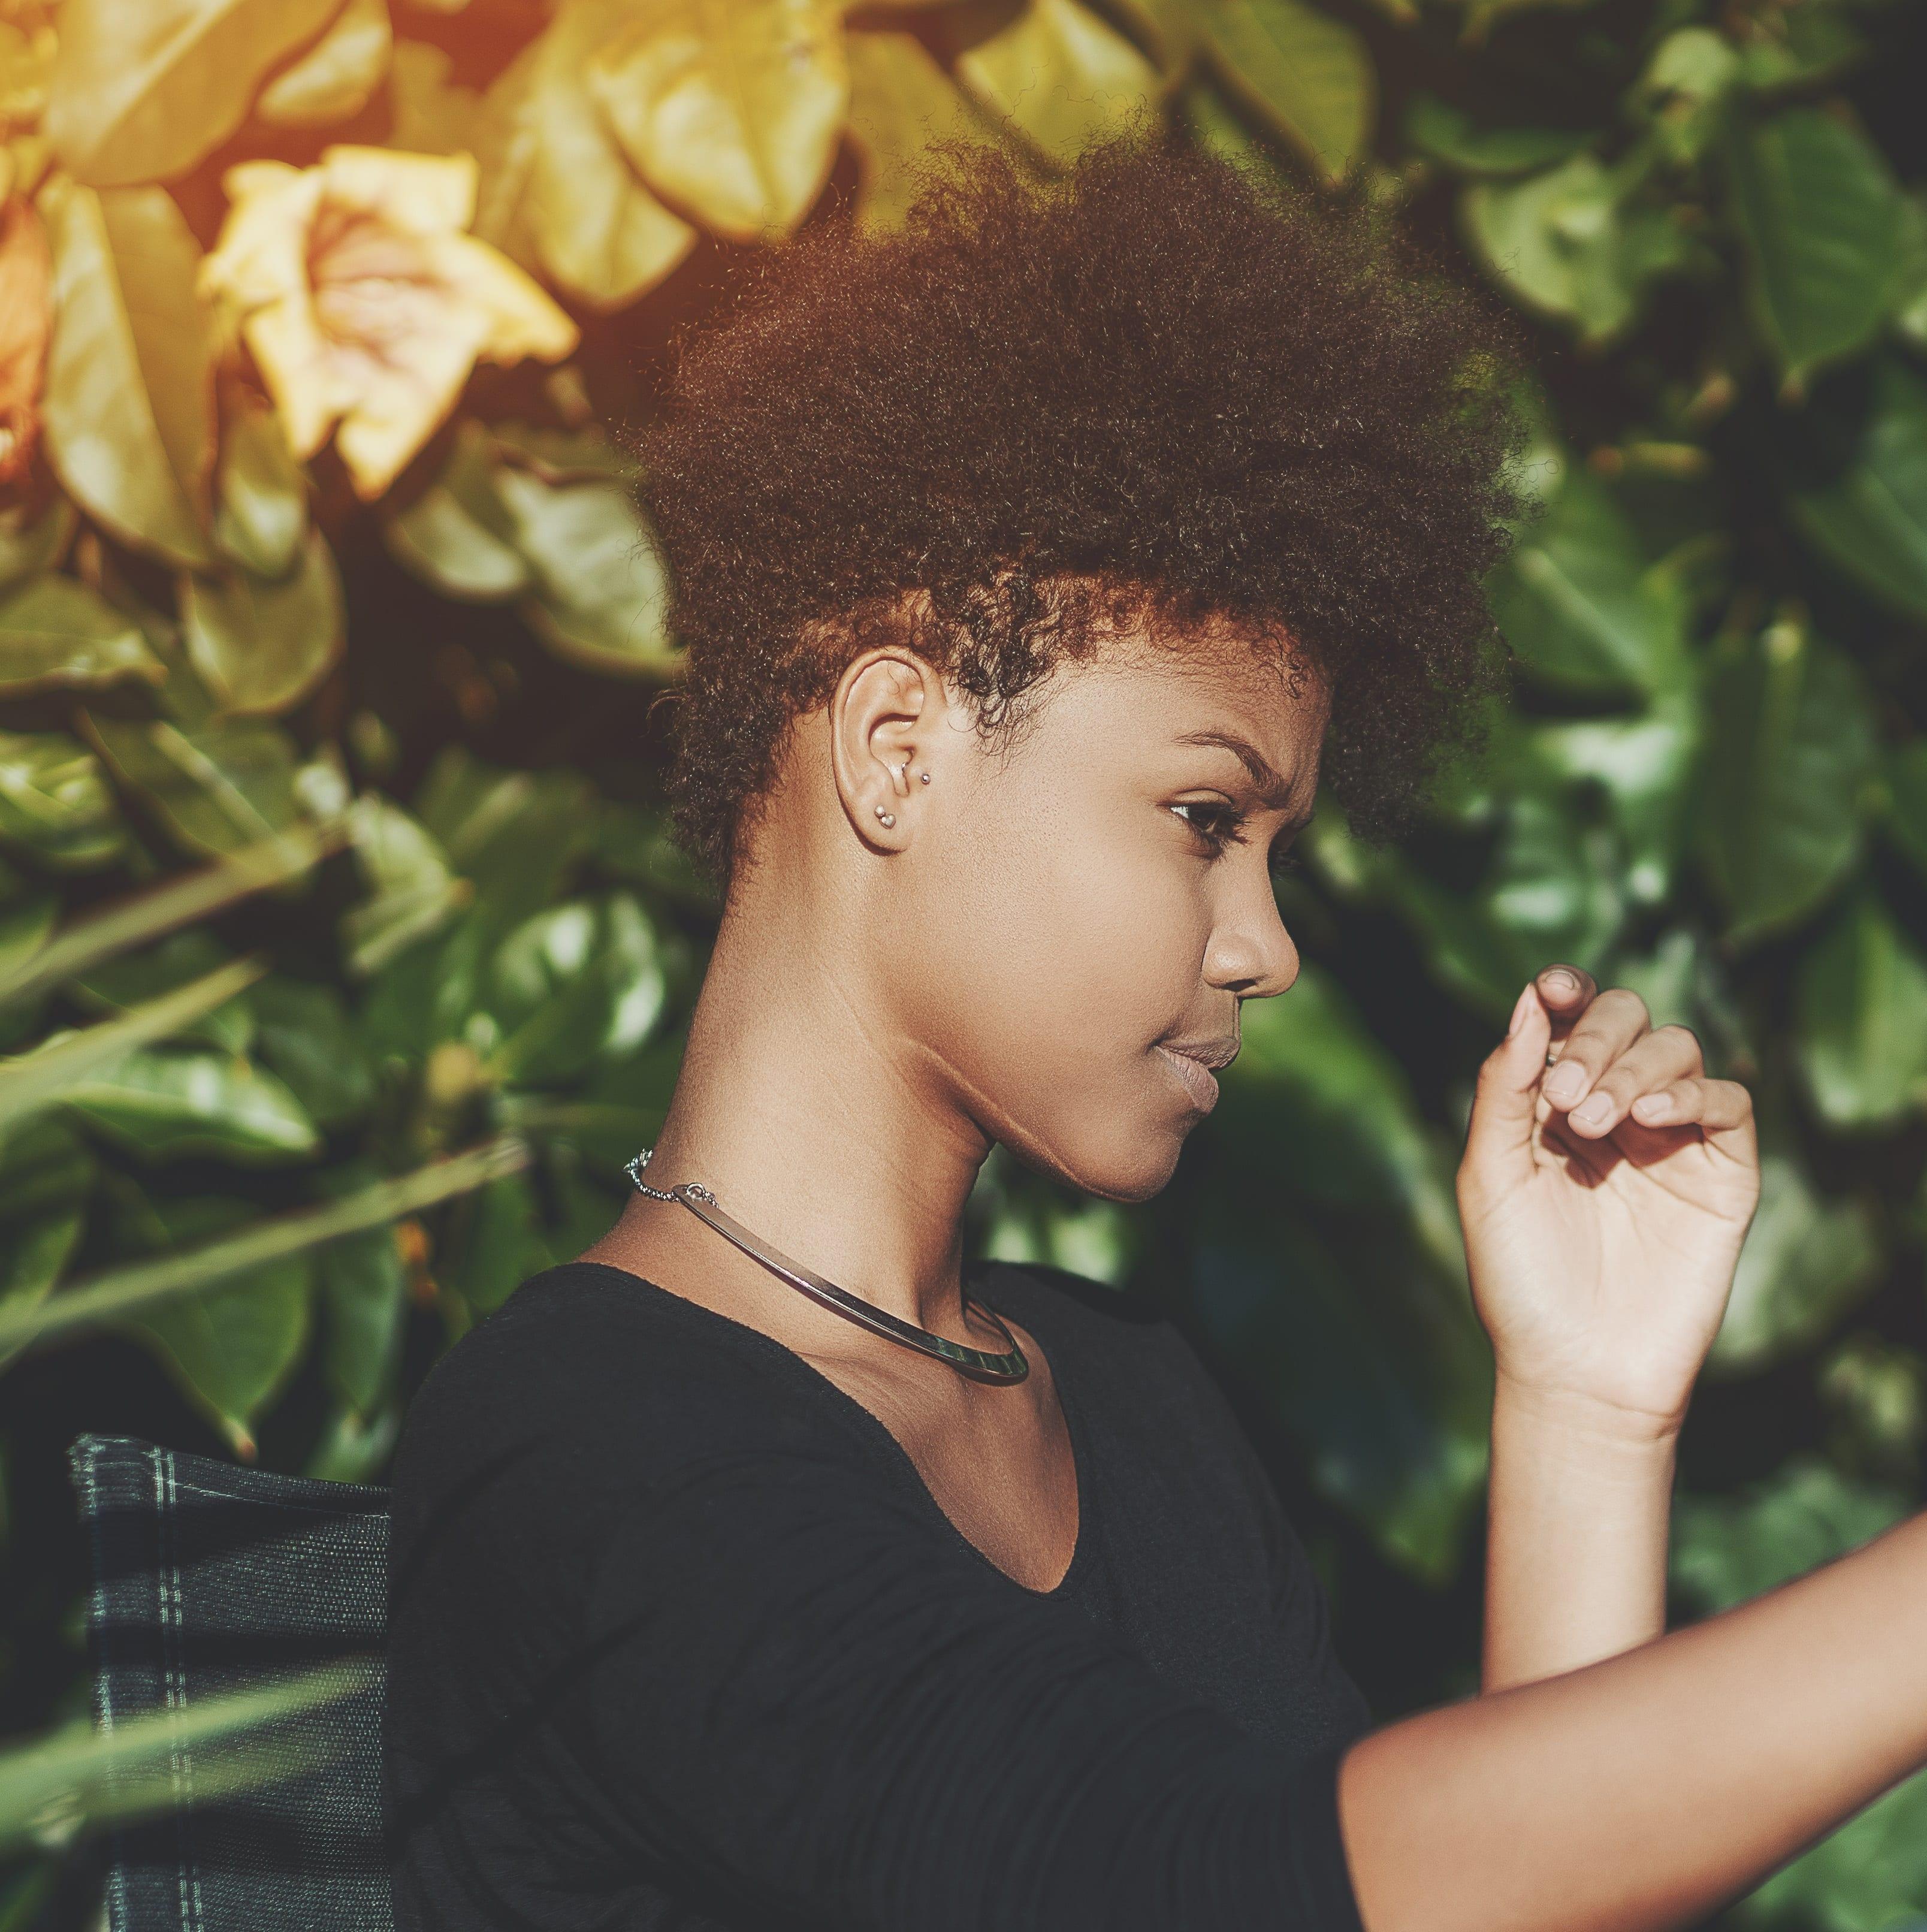 Cabelo Curto Feminino Tendências De Cabelo Curto Para 2019